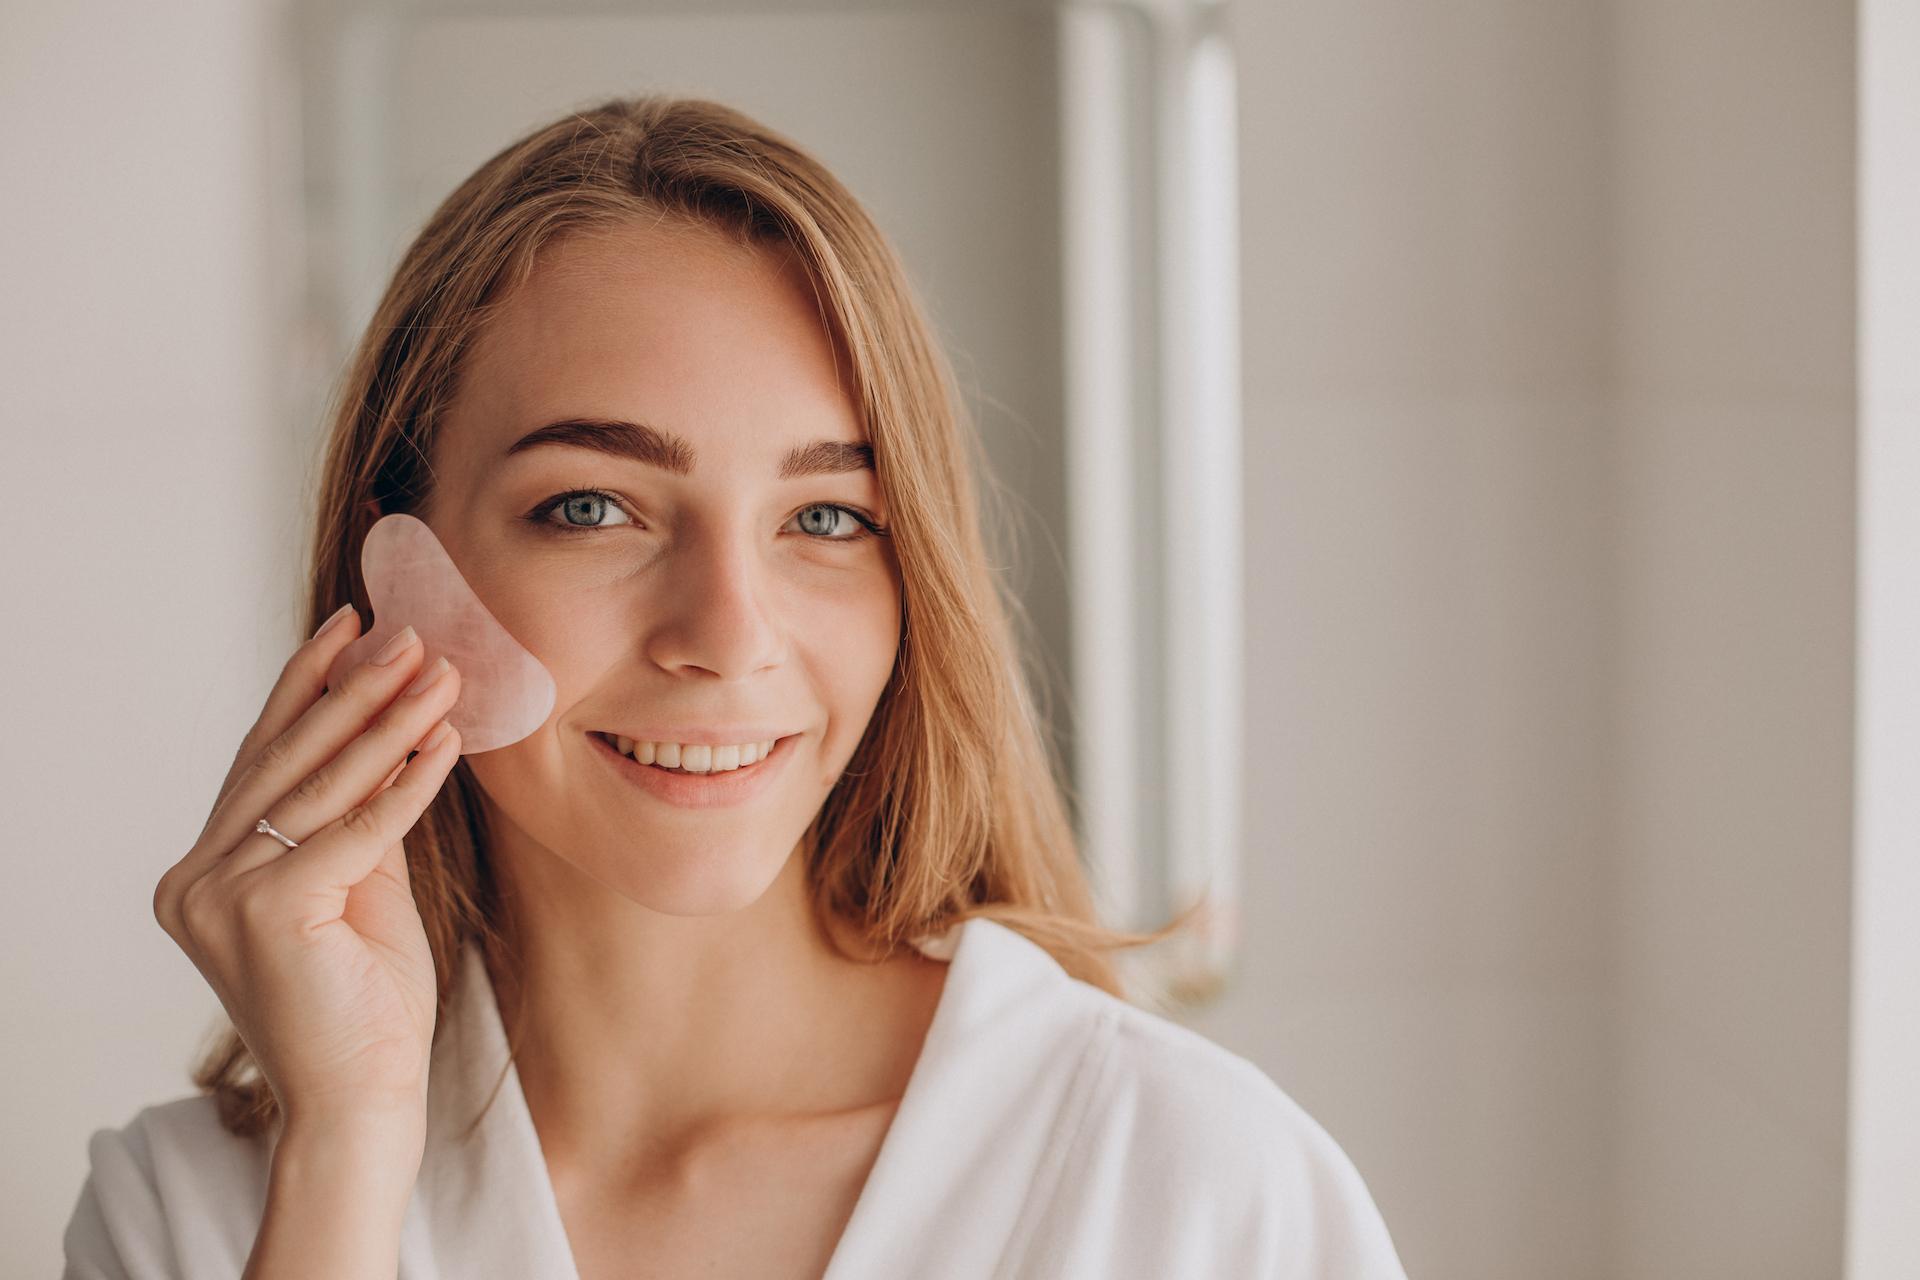 Woman holding a gua sha stone, getting ready for a gua sha facial